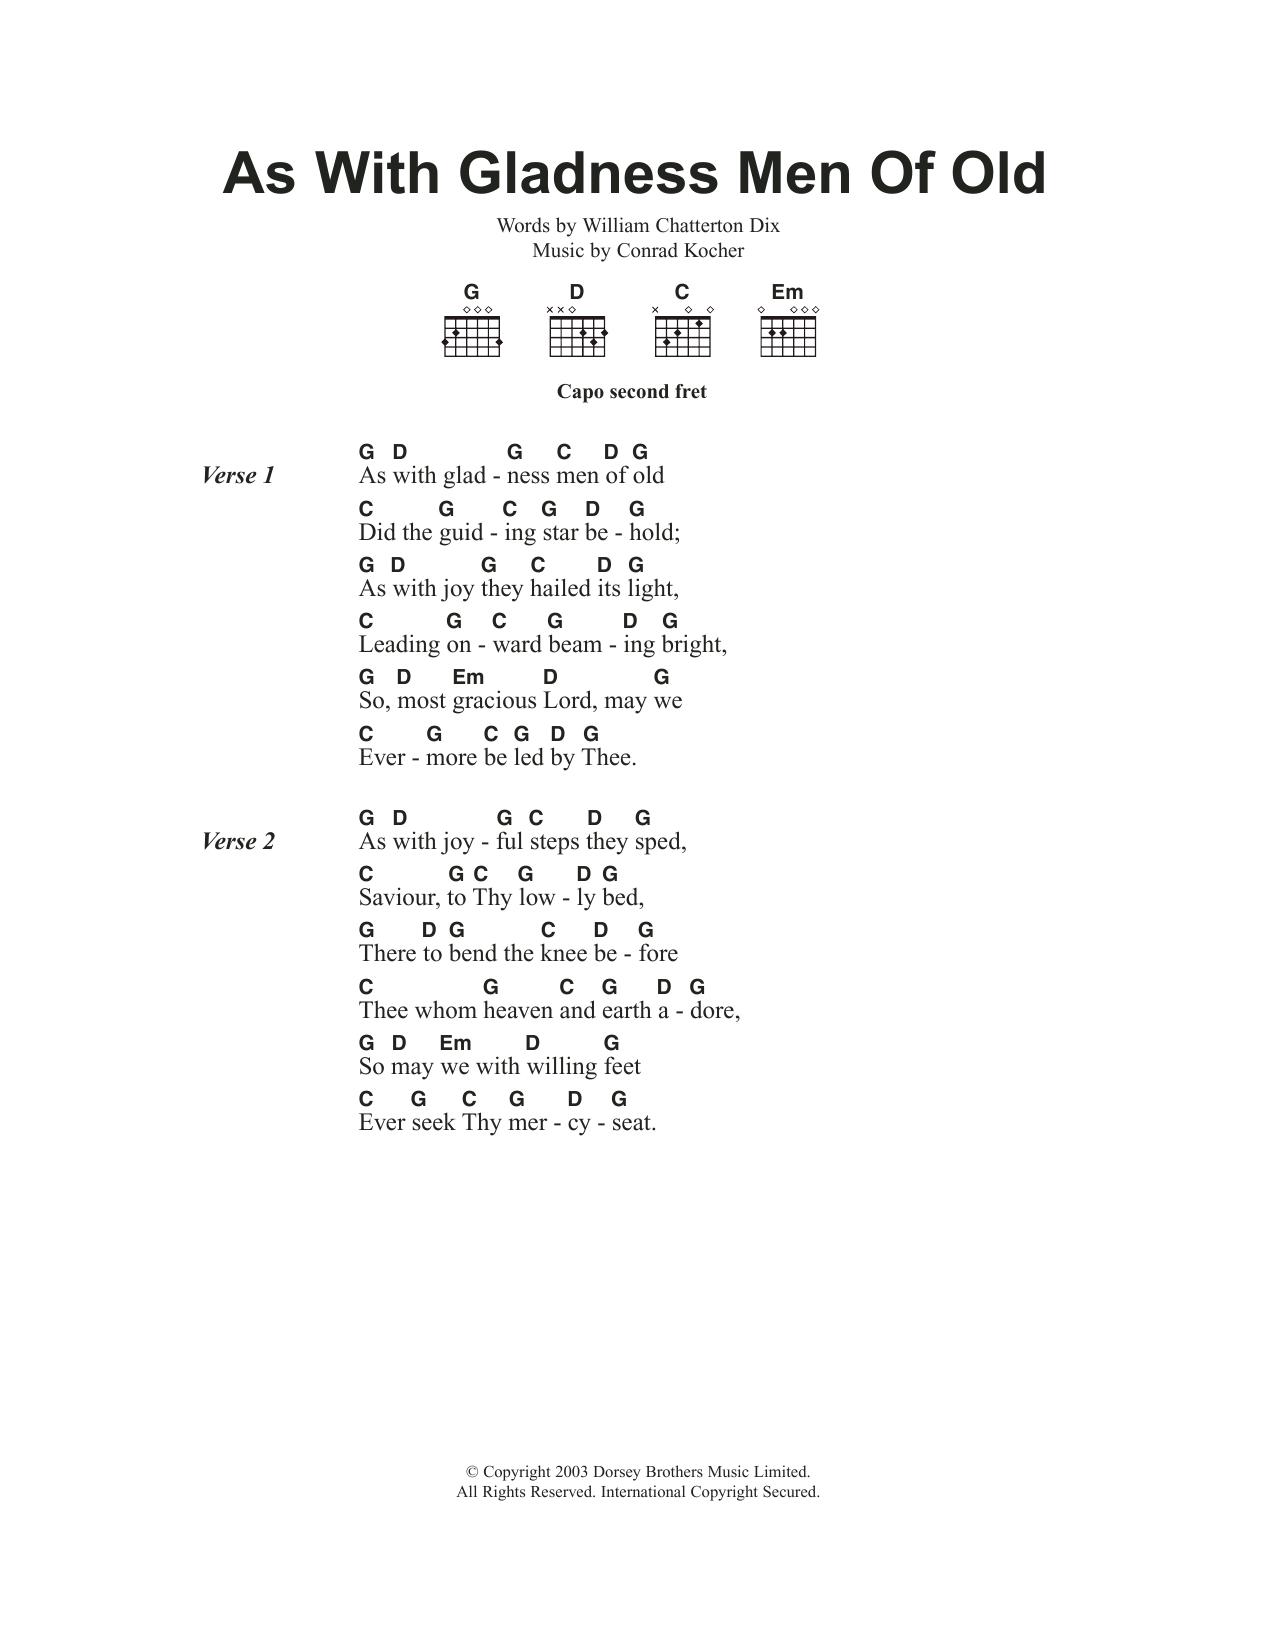 As With Gladness Men Of Old Sheet Music | Christmas Carol | Lyrics ...